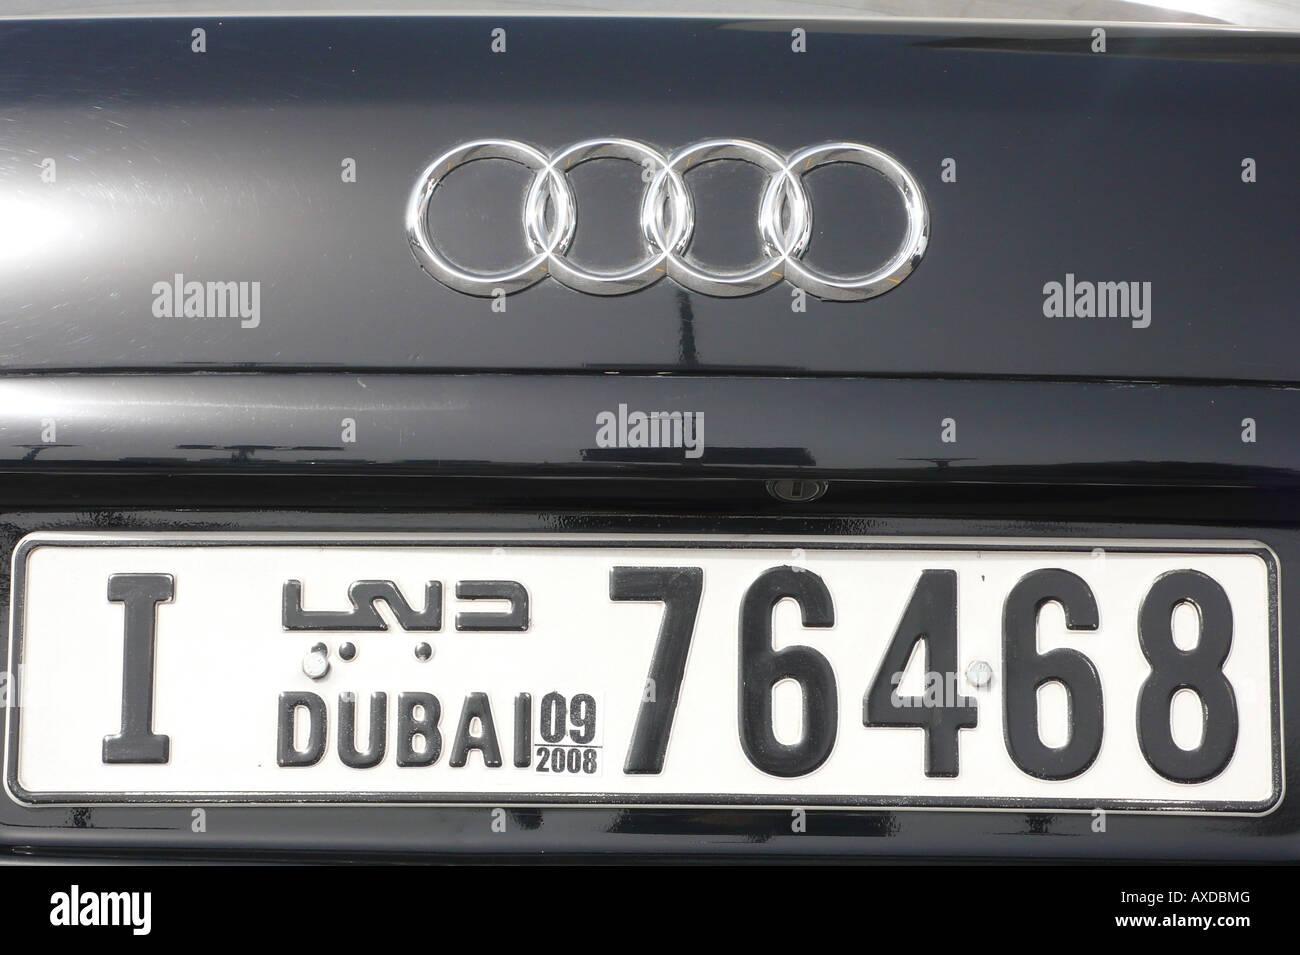 Dubai Licence Plate Stock Photo 16809759 Alamy